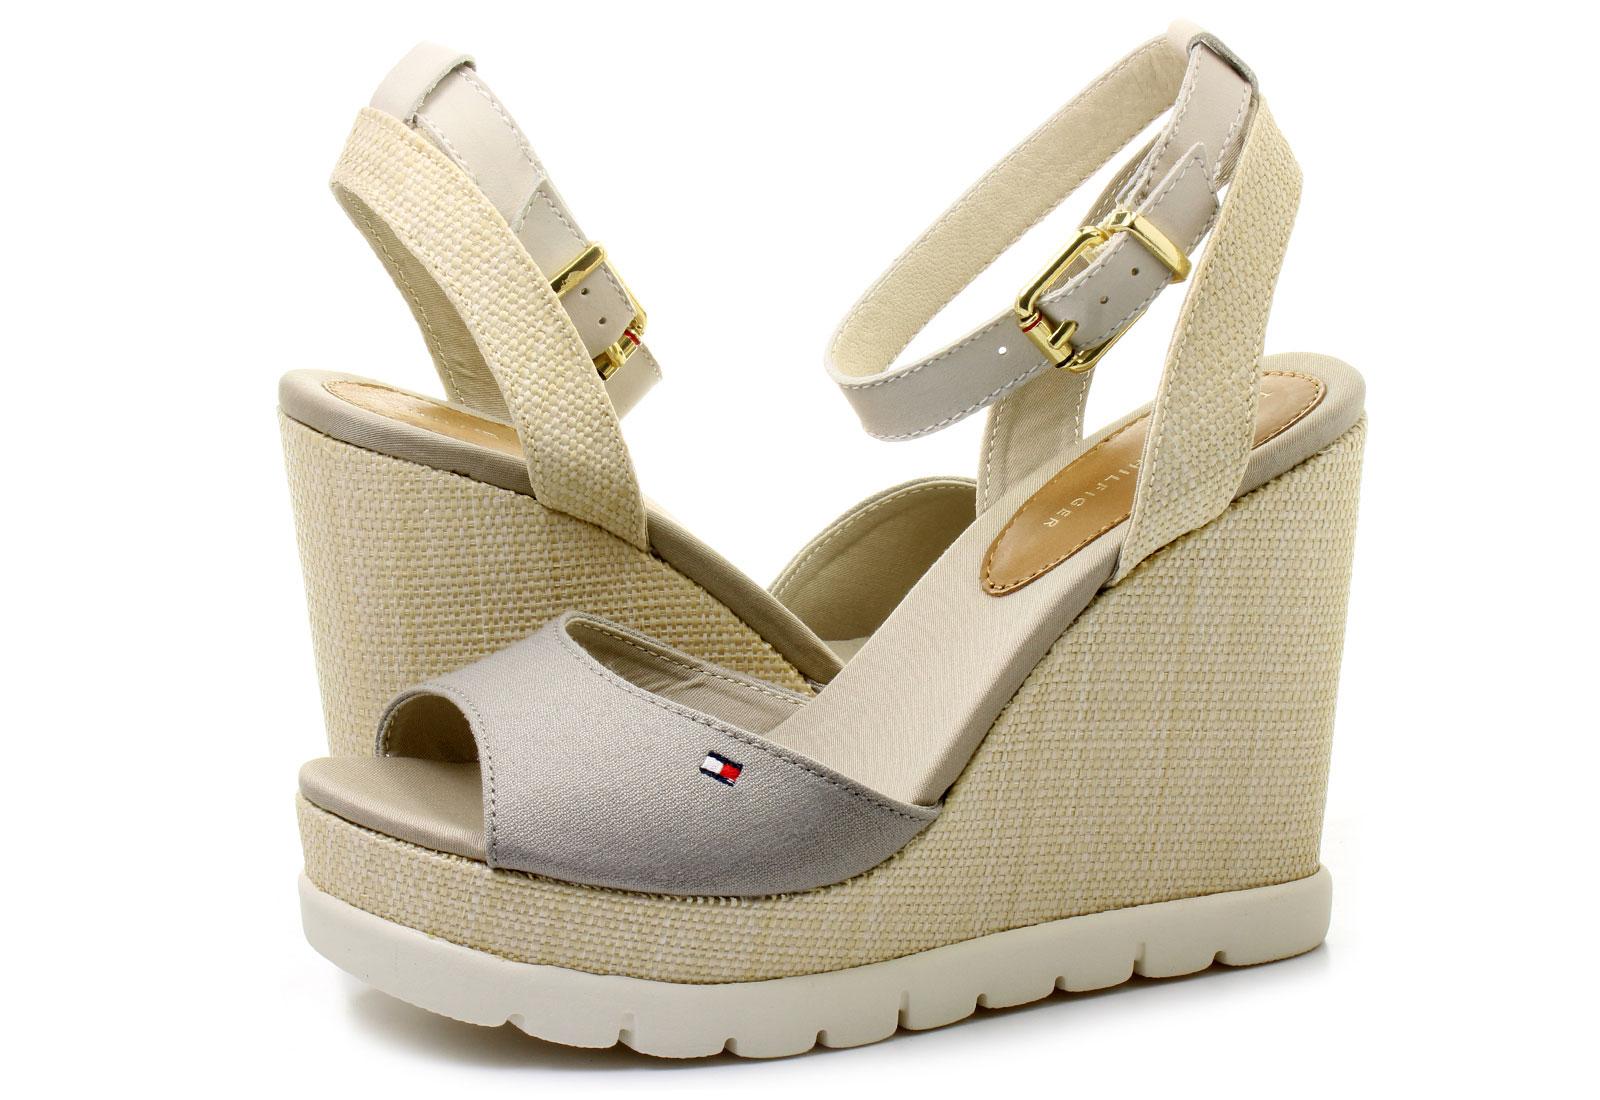 tommy hilfiger sandale valencia 1d 16s 0747 050 office shoes romania 84114354e1